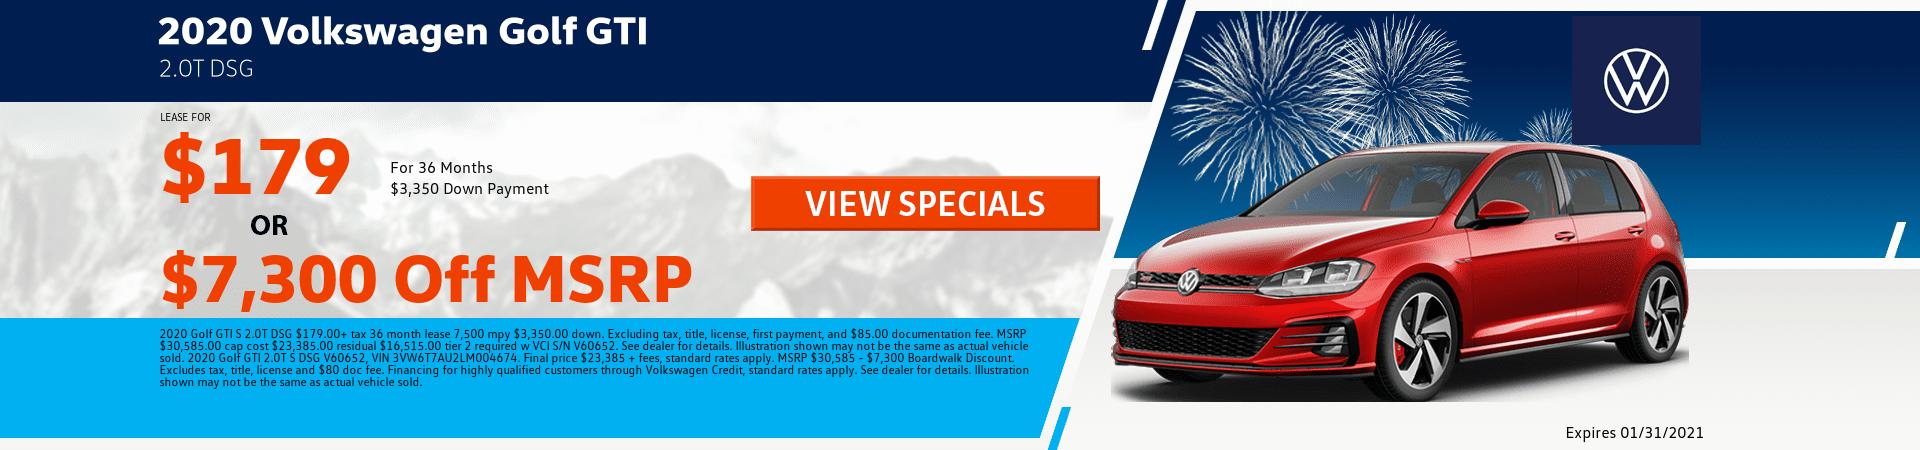 2020-Volkswagen-Golf-GTI-2.0T-DSG-50